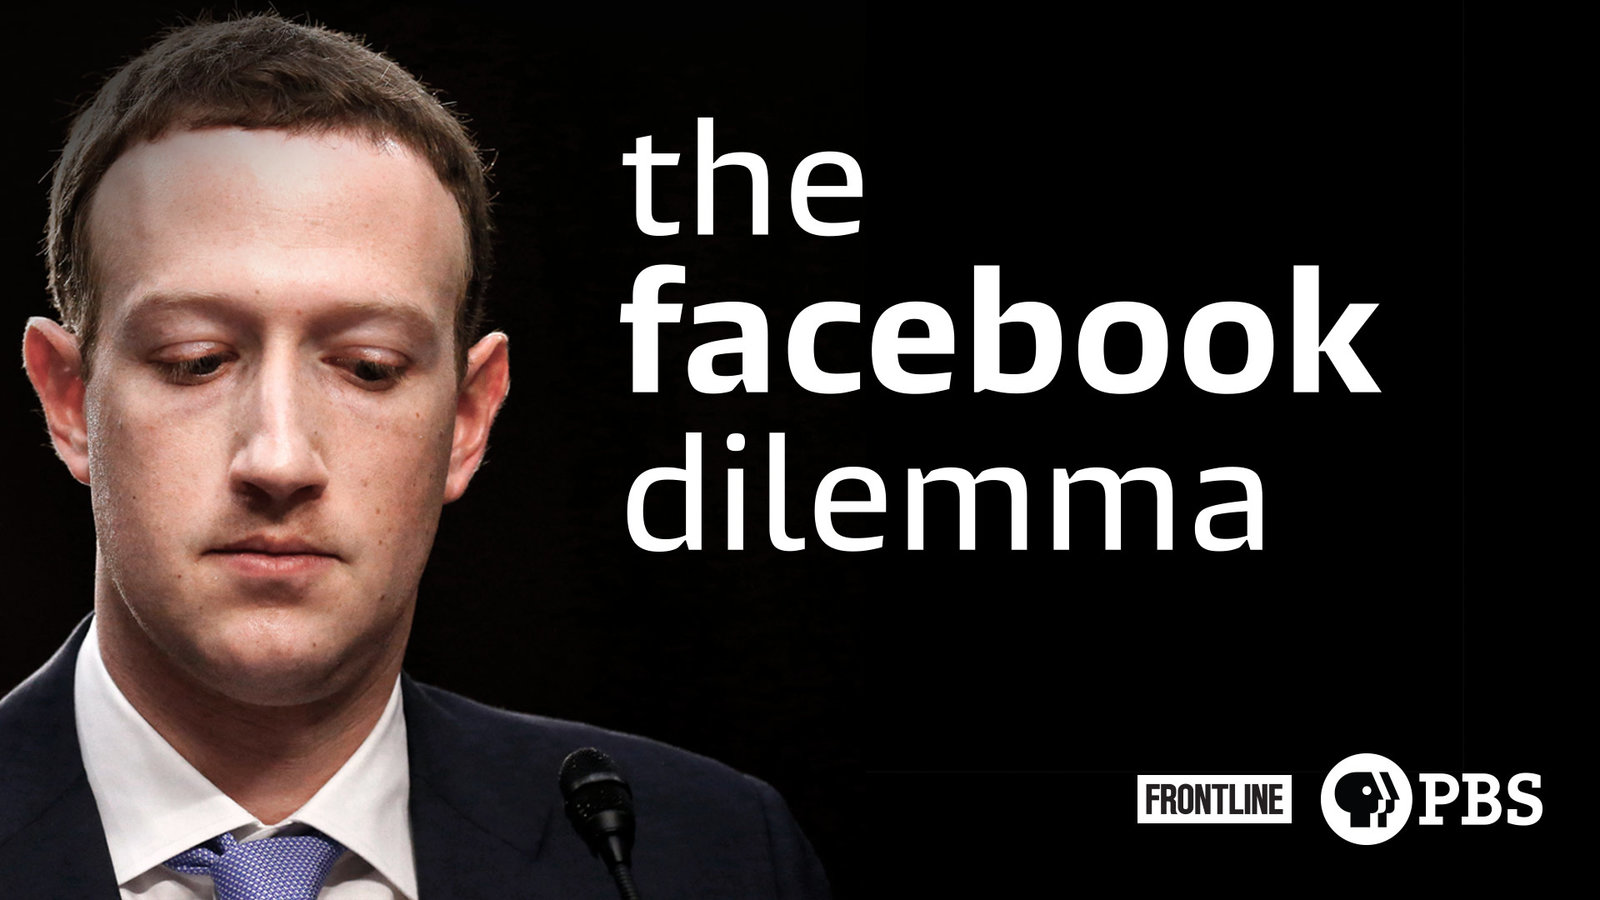 Frontline: The Facebook Dilemma